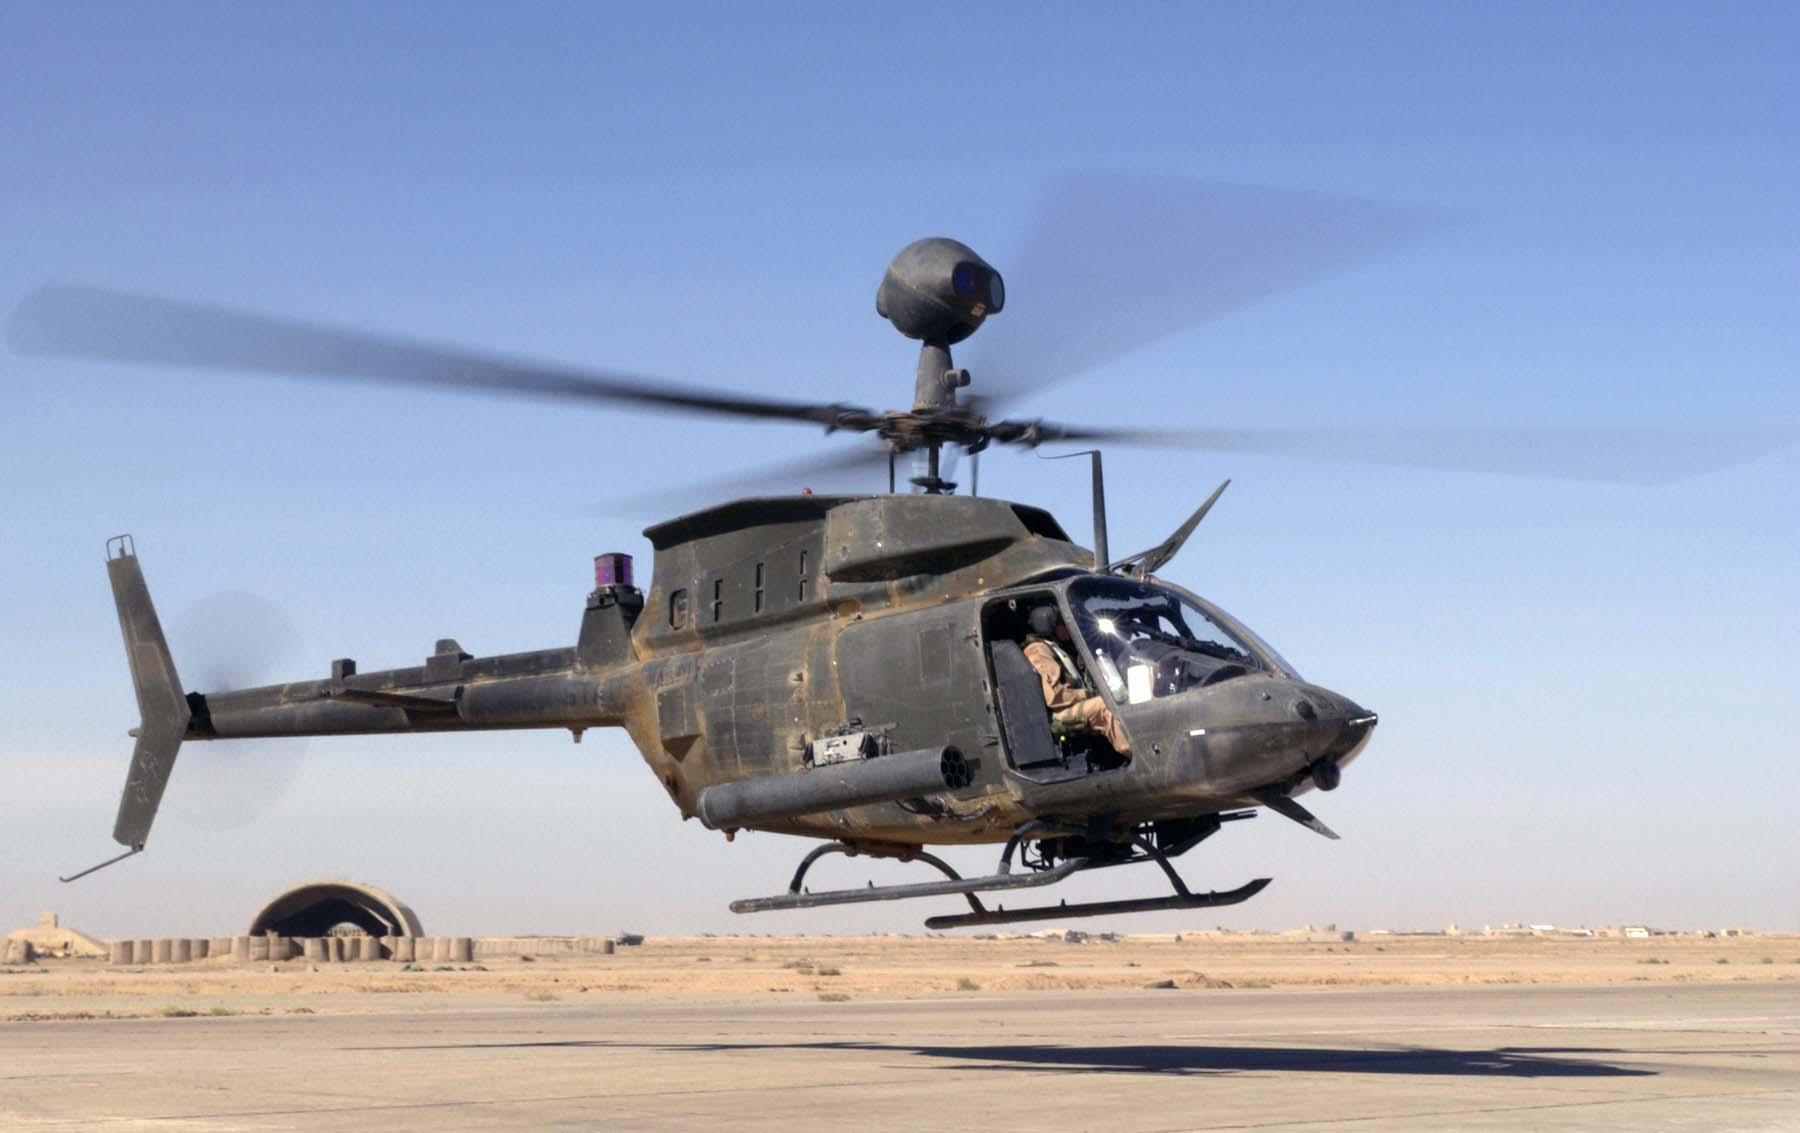 На Гавайях разбился армейский вертолет OH-58D